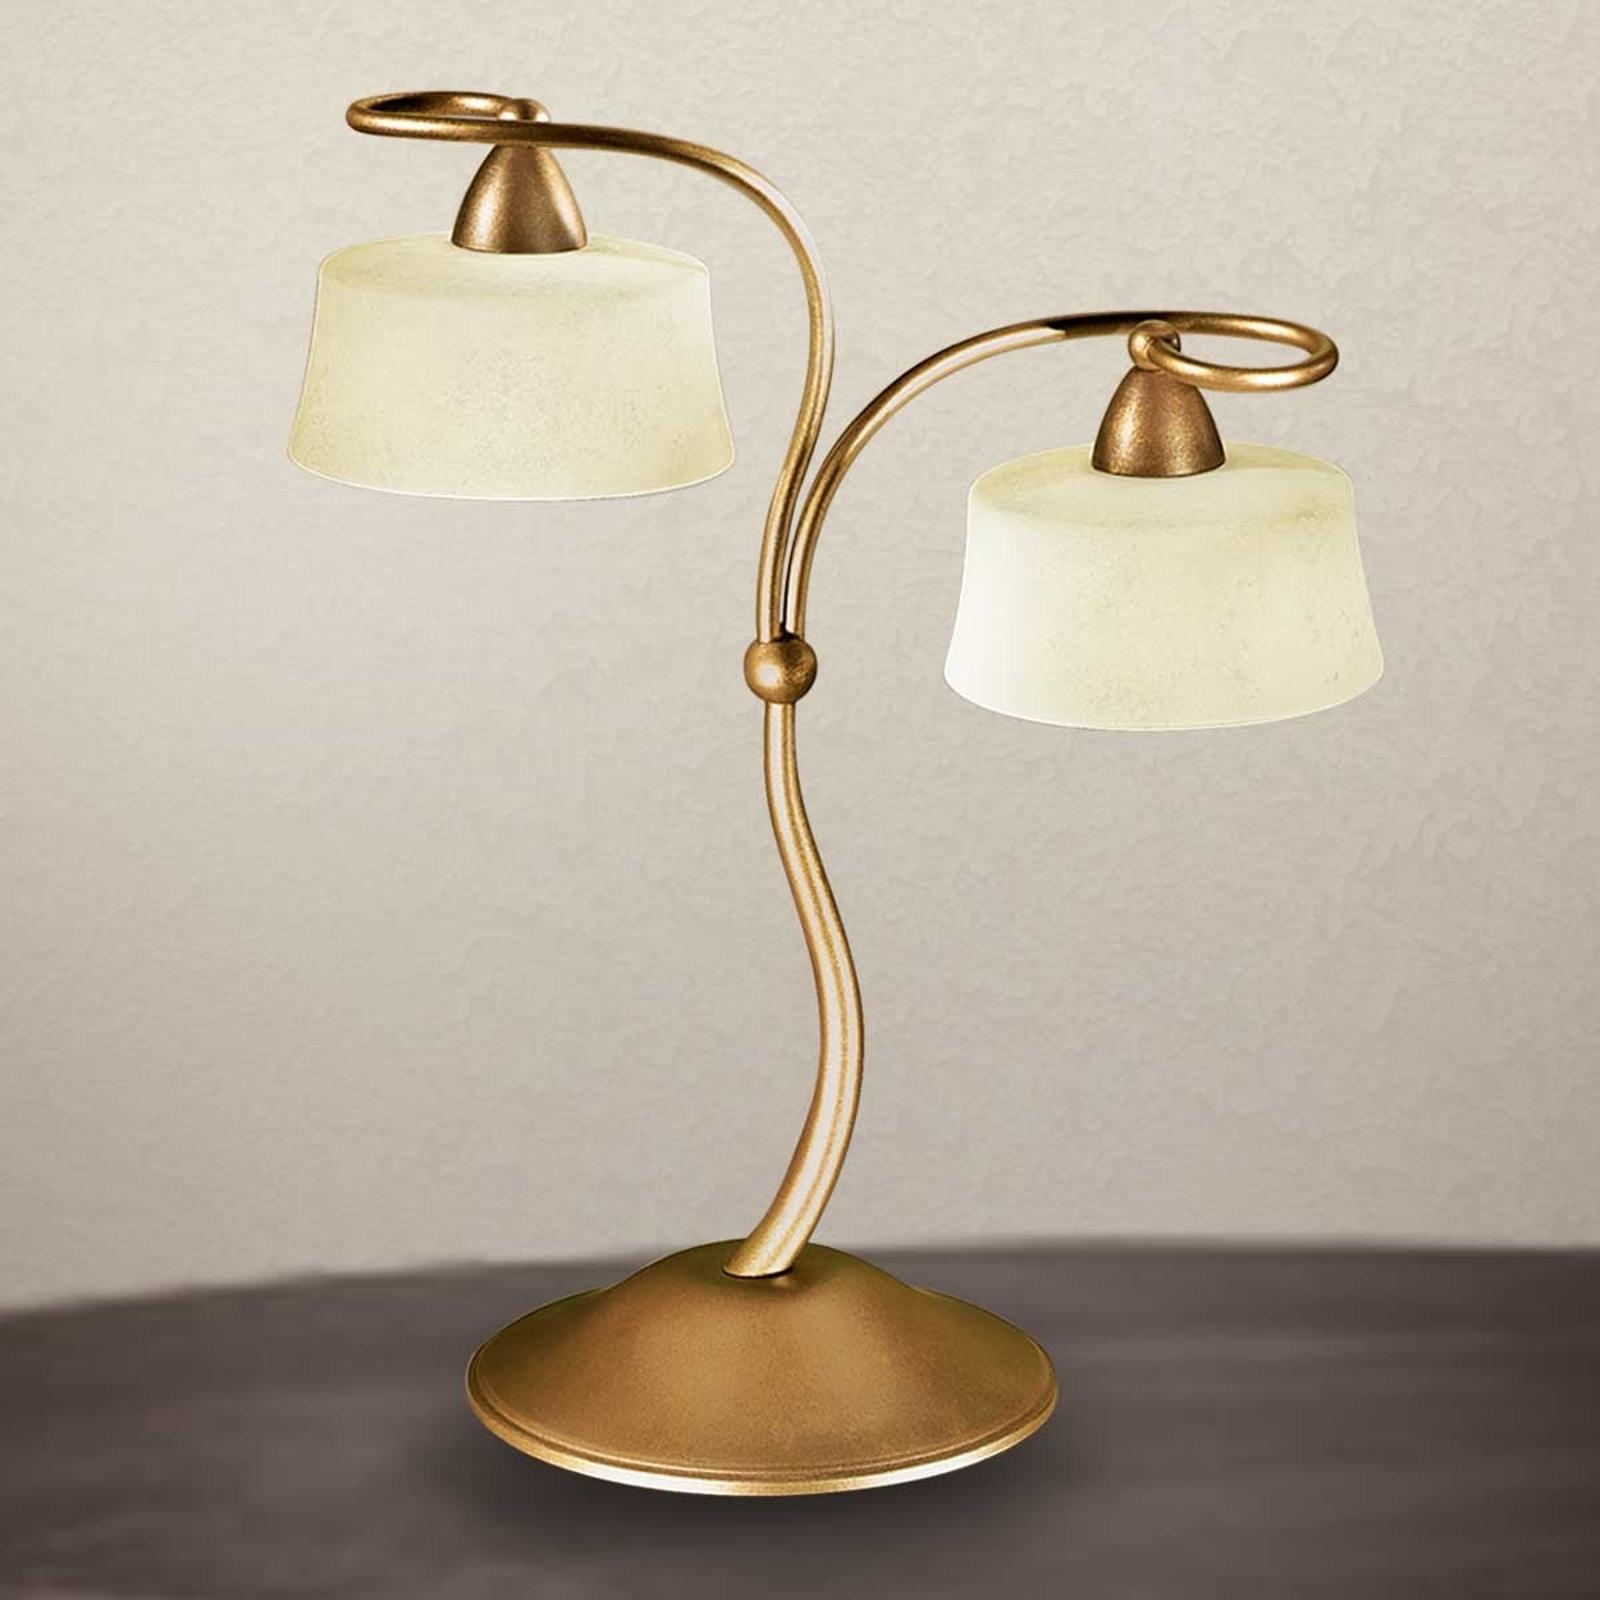 Tafellamp Alessio met Scavo glazen kappen, 2-lamps